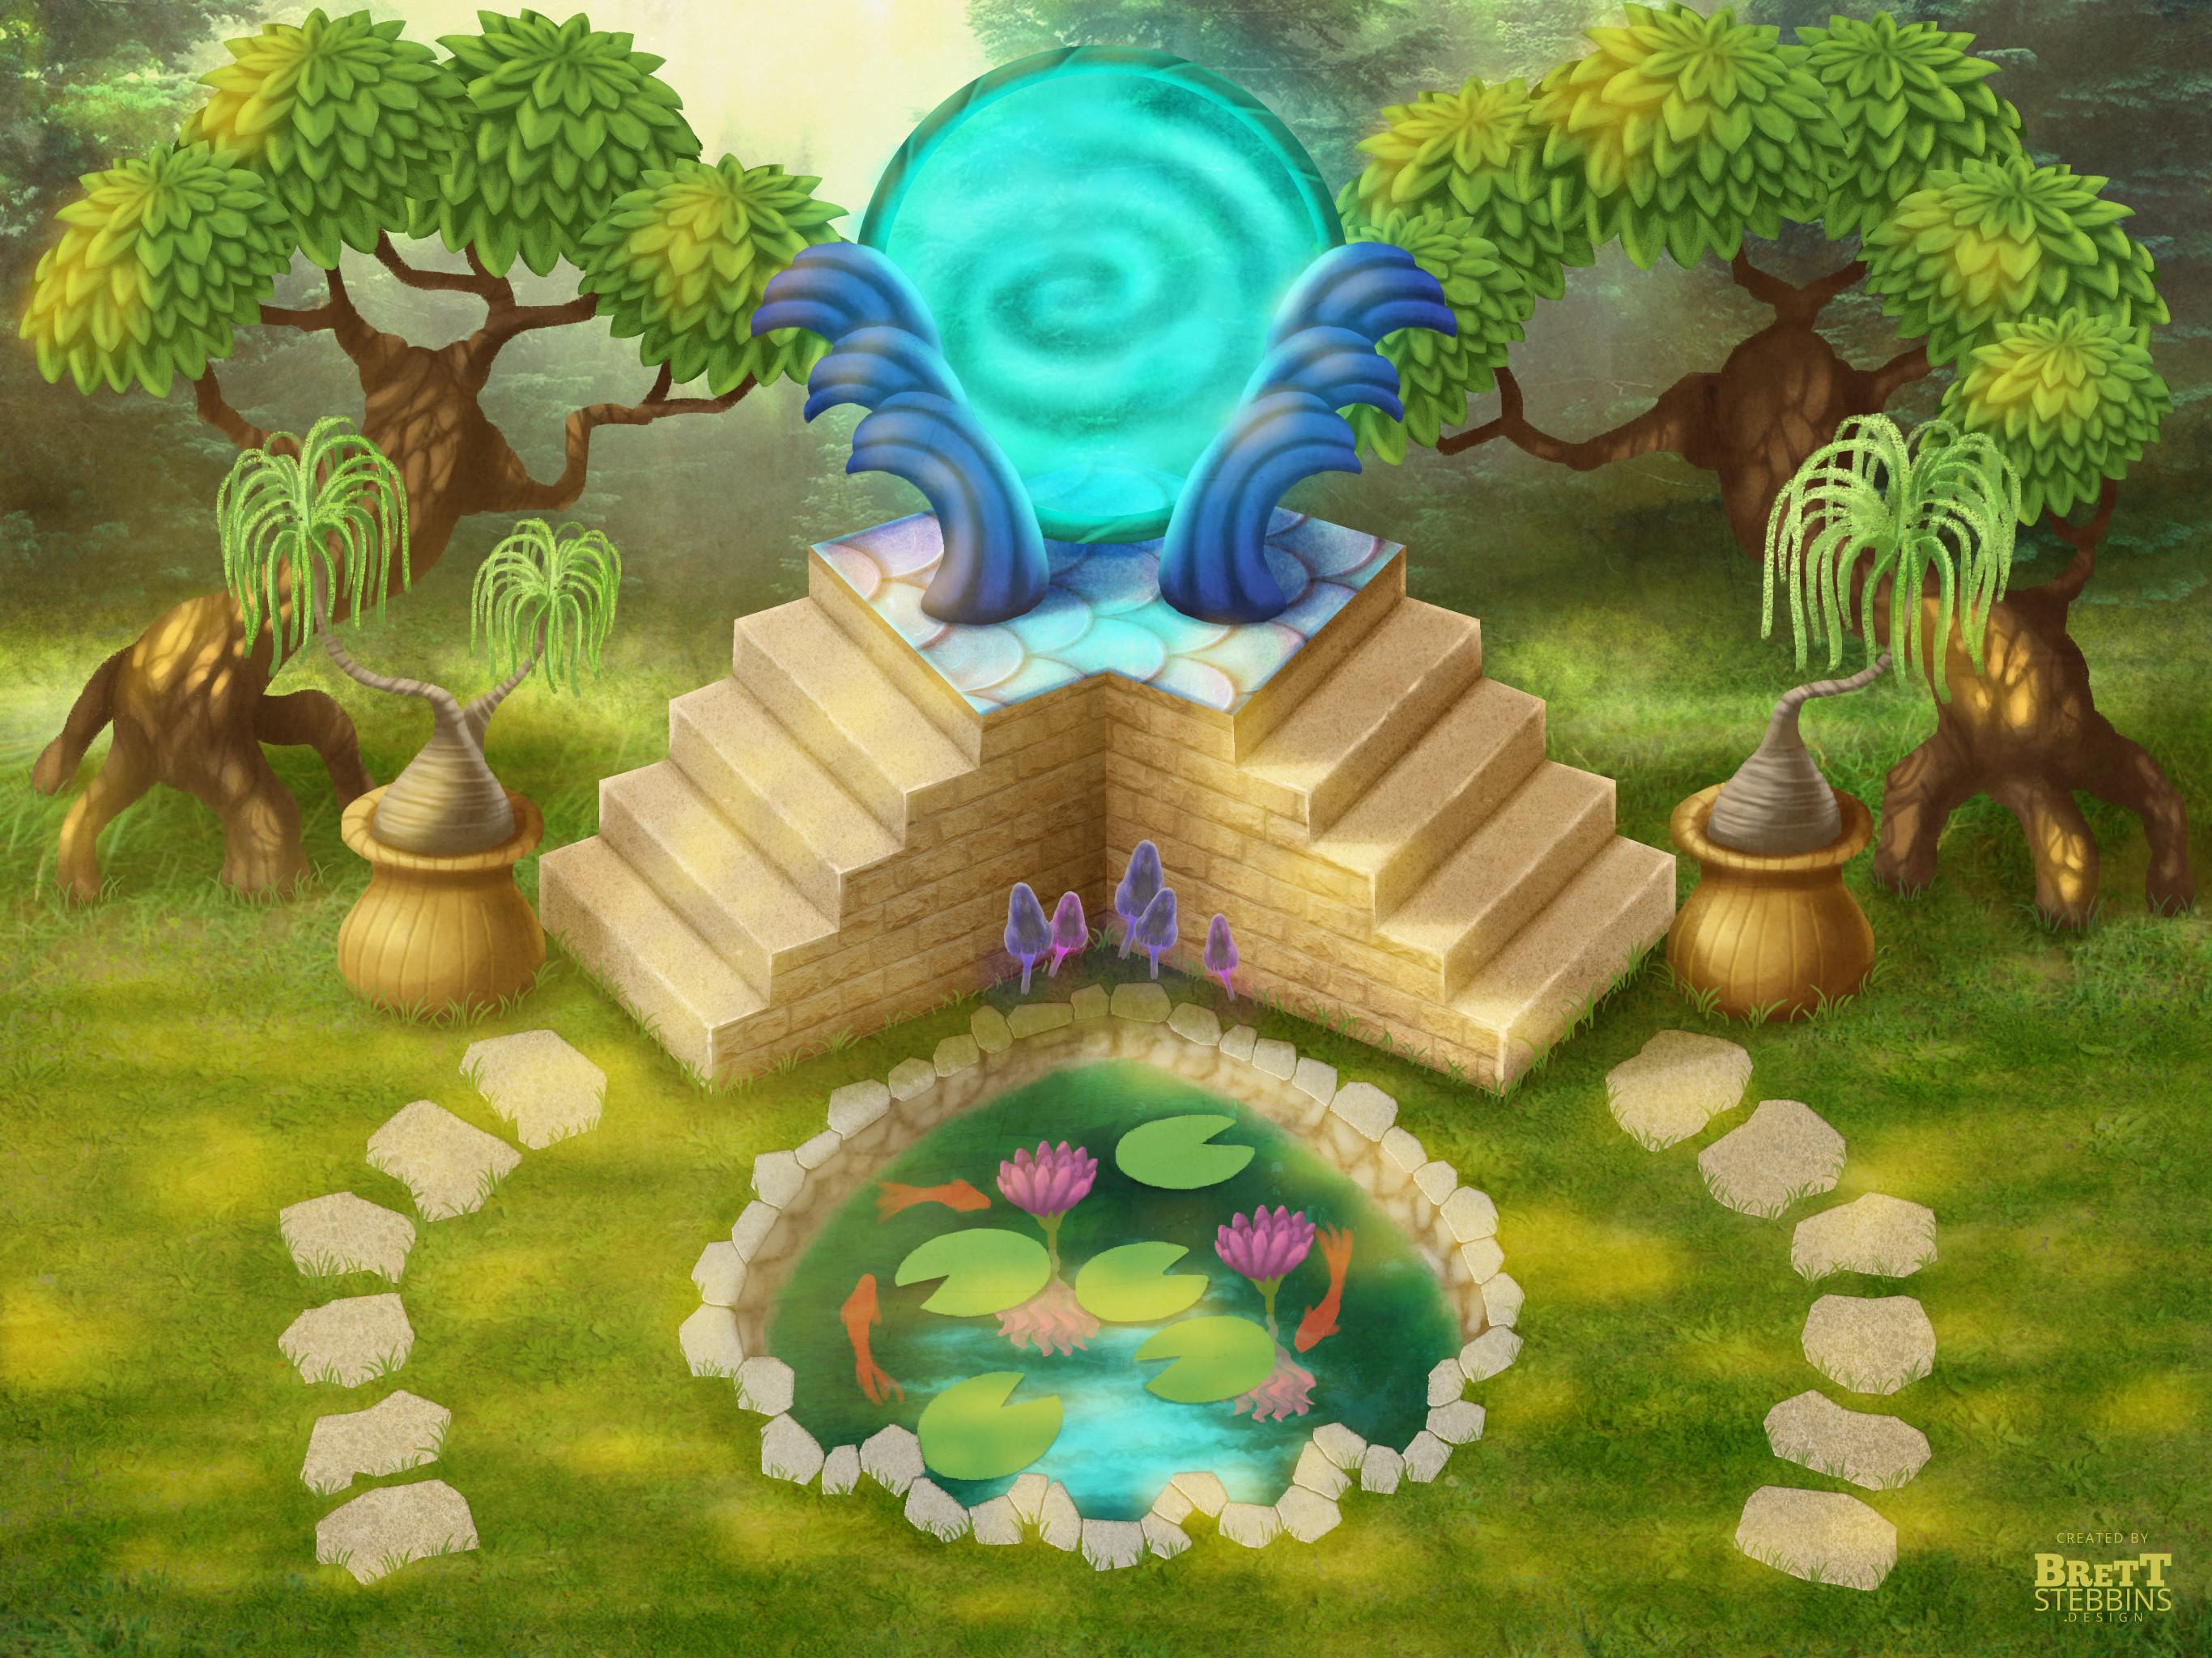 Final Concept Art - The Portal